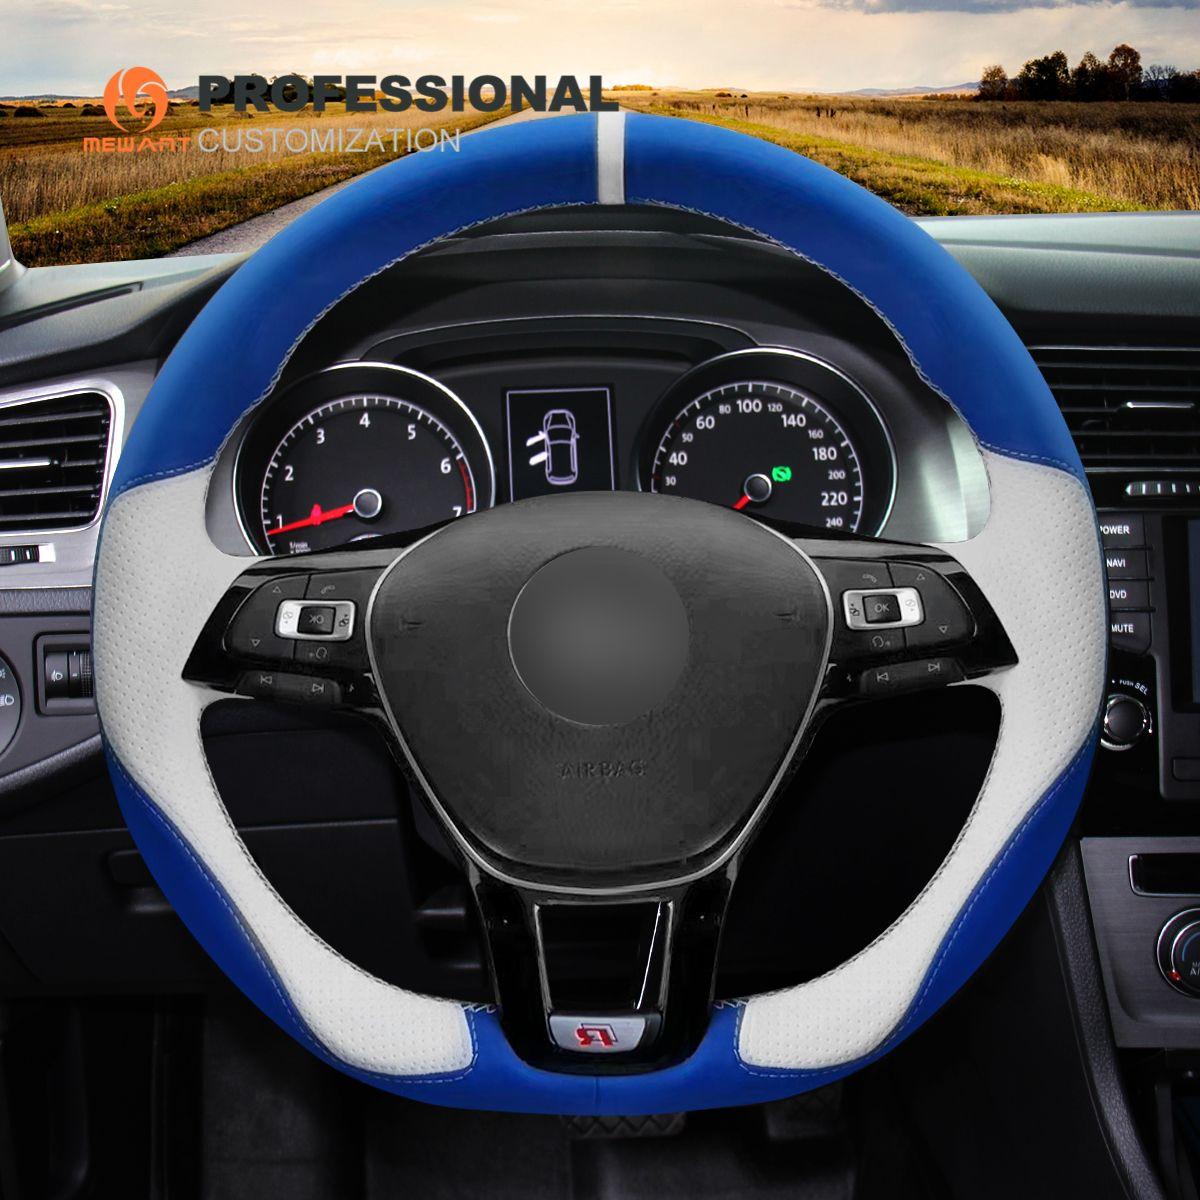 MEWANT Blue White Leather Steering Wheel Cover for Volkswagen VW Golf 7 Mk7 New Polo Jetta Passat B8 Tiguan Sharan Touran Up